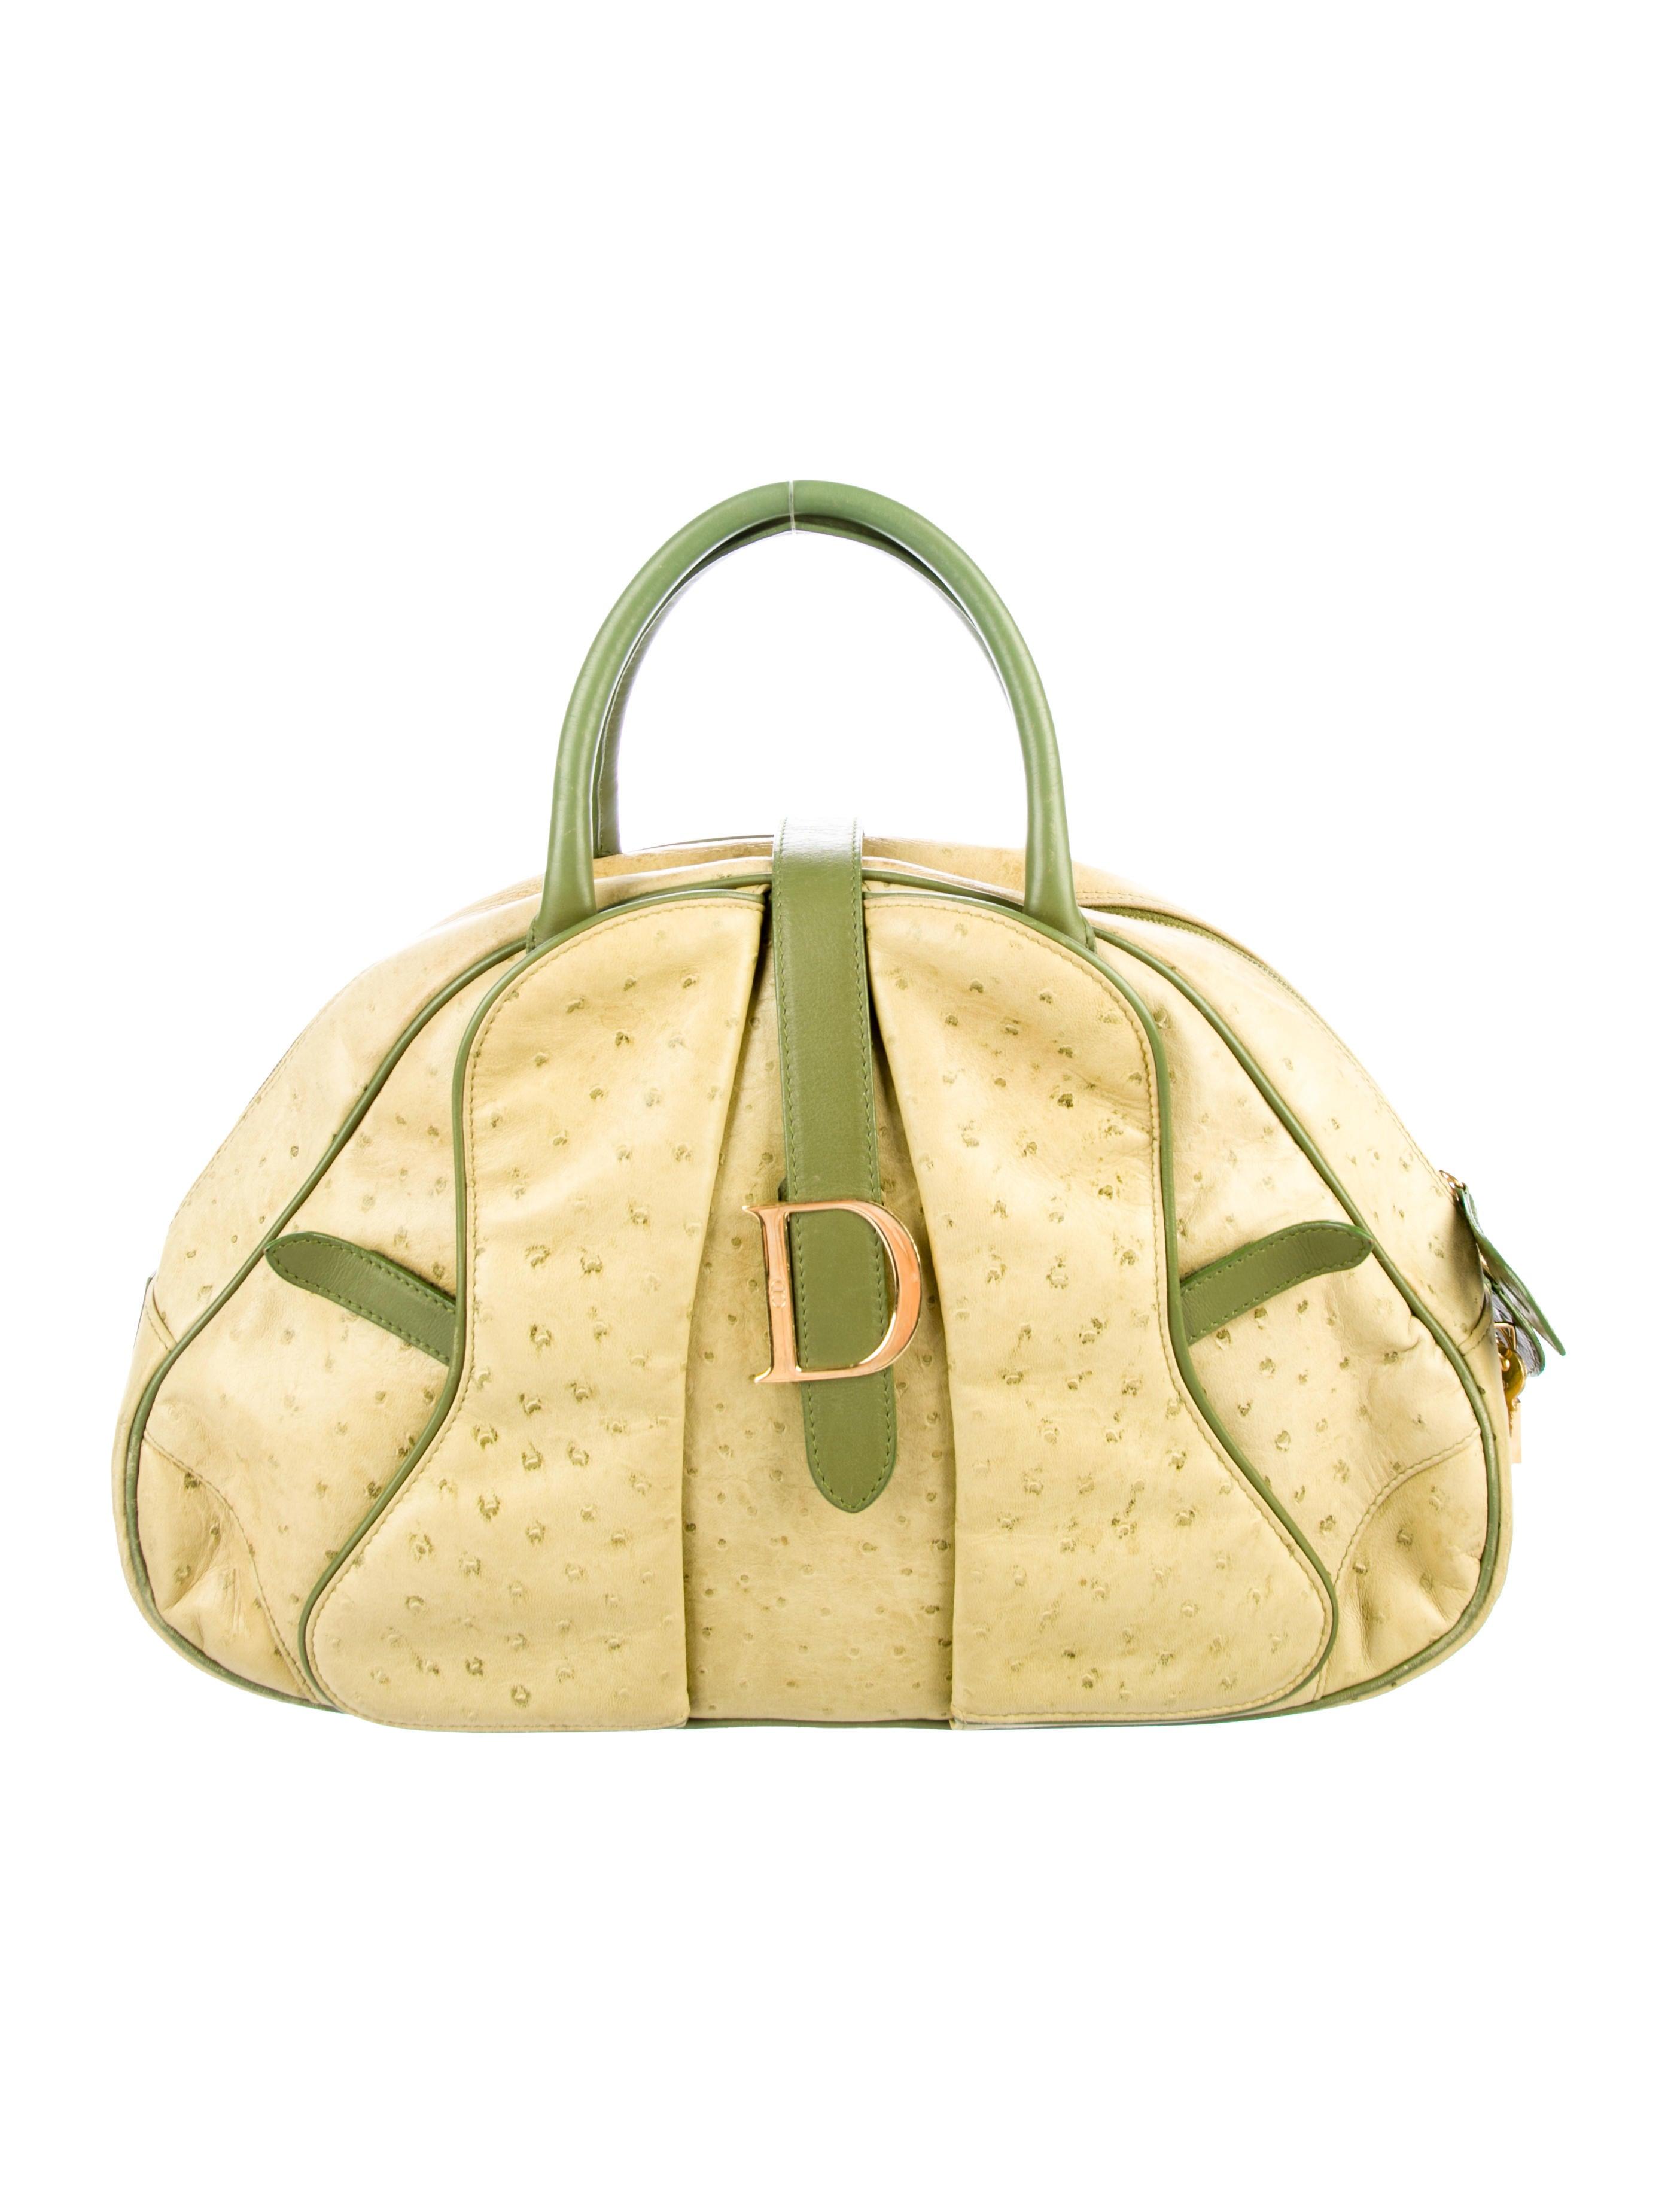 148270ad95d8 Christian Dior Ostrich Double Saddle Bag - Handbags - CHR85498